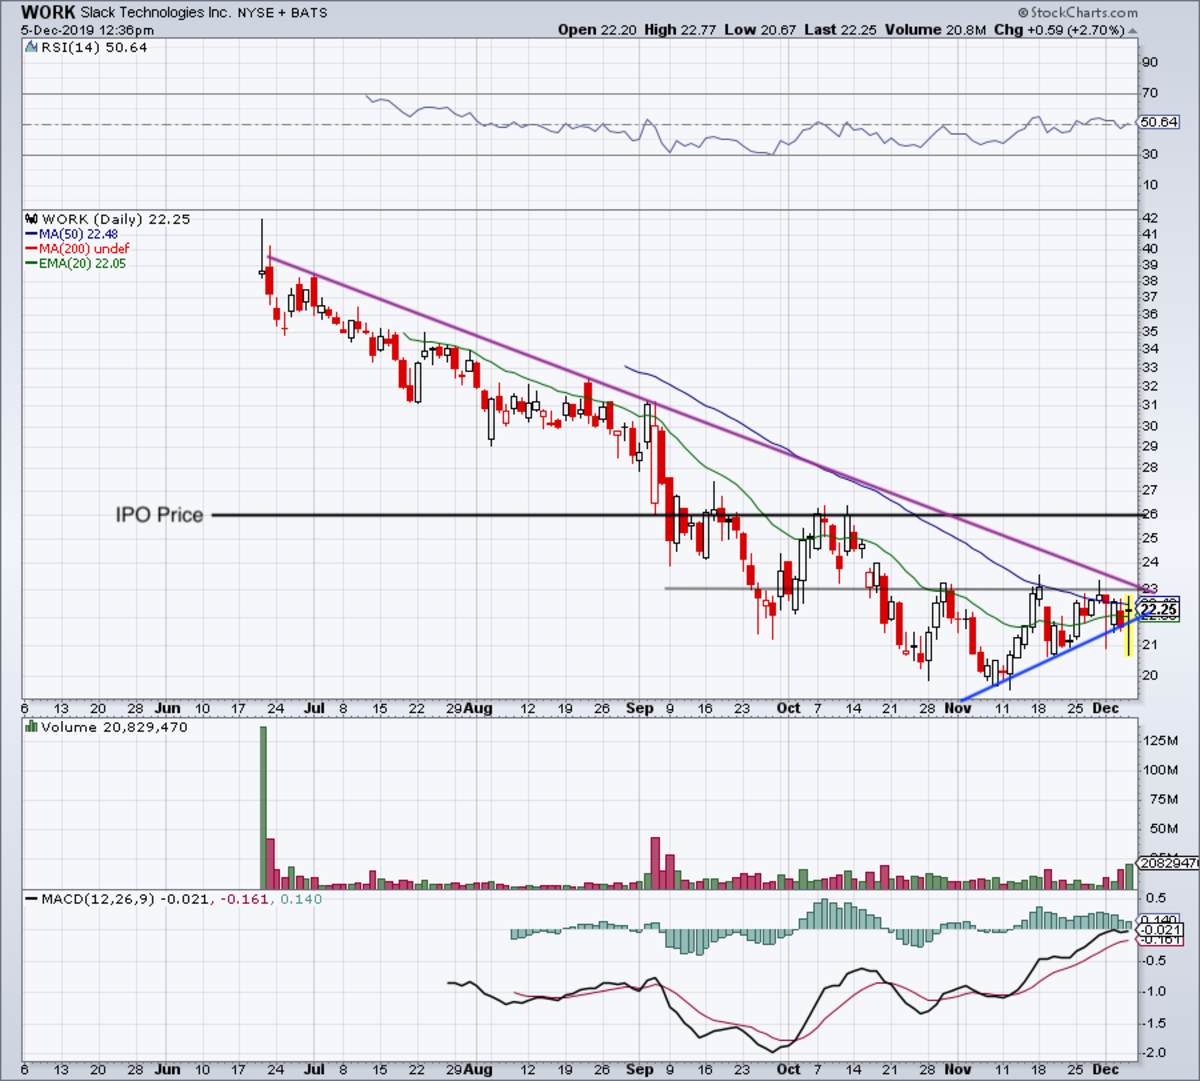 Daily chart of Slack stock.